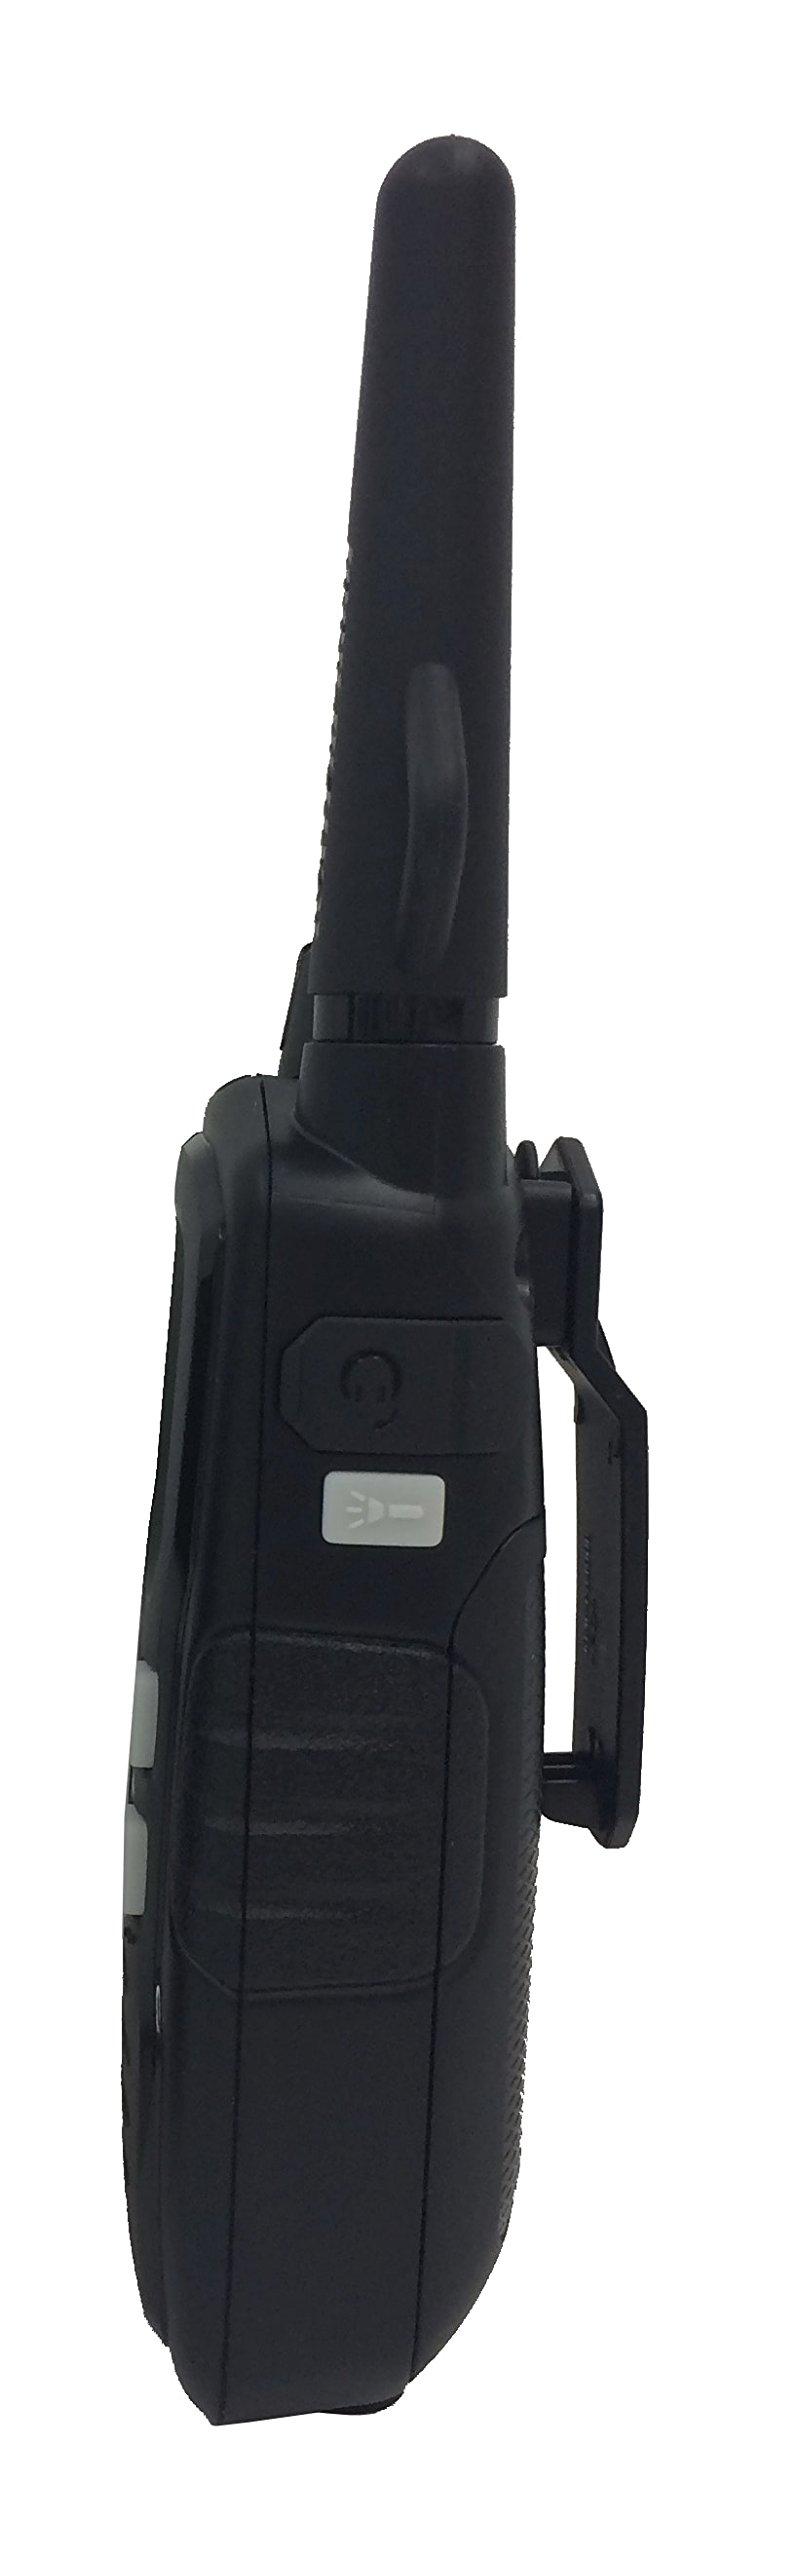 Cobra CXY900 Walkie Talkies 40-Mile Two-Way Radios, Rechargeable (Pair) by Cobra (Image #4)